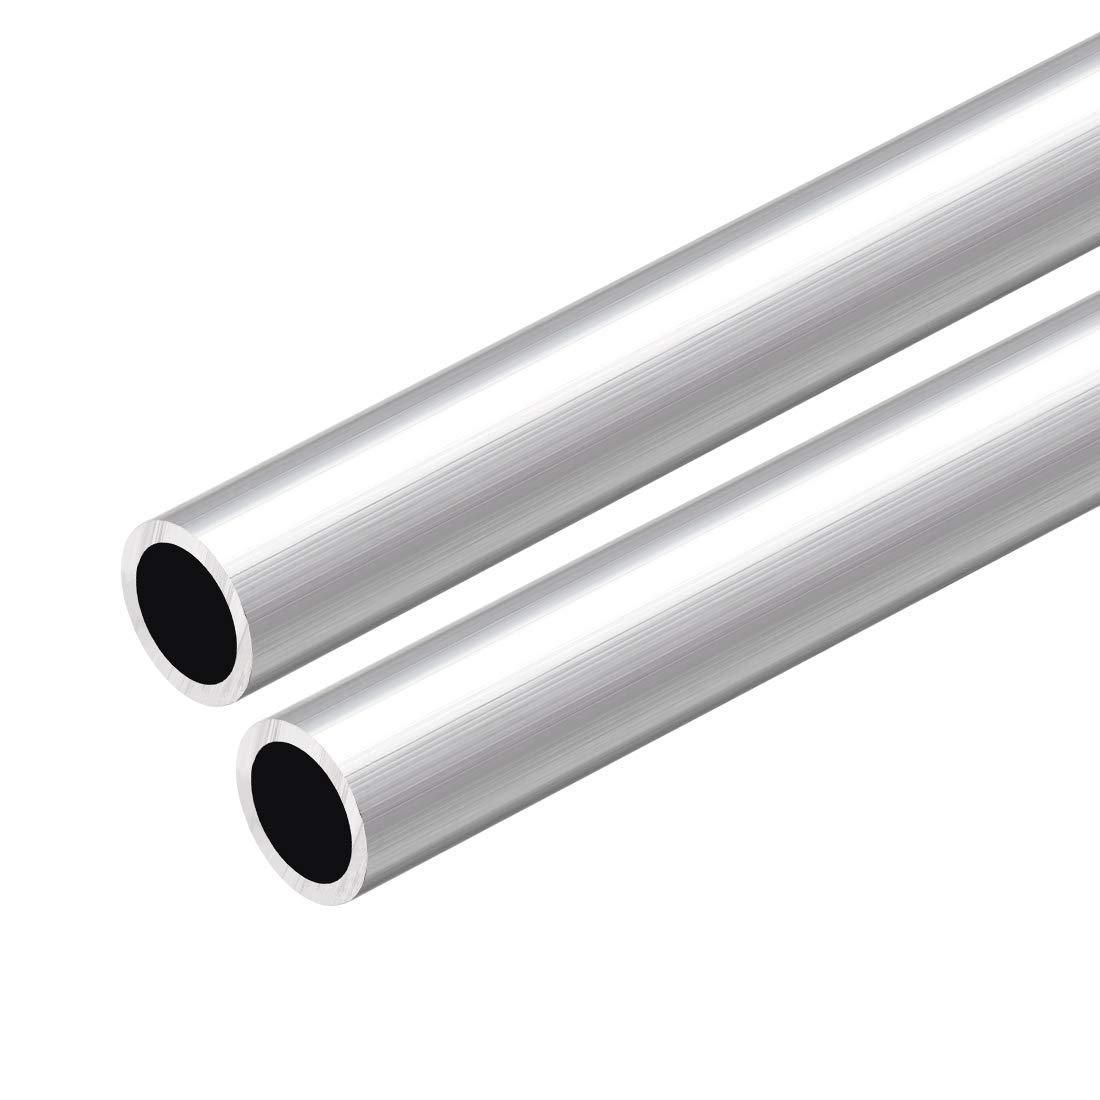 sourcing map 6063 Aluminio Redondo Tubo 300mm Longitud 14-15mm OD Seamless tubos rectos de aluminio ID de 10 mm x OD de 14 mm 3 piezas